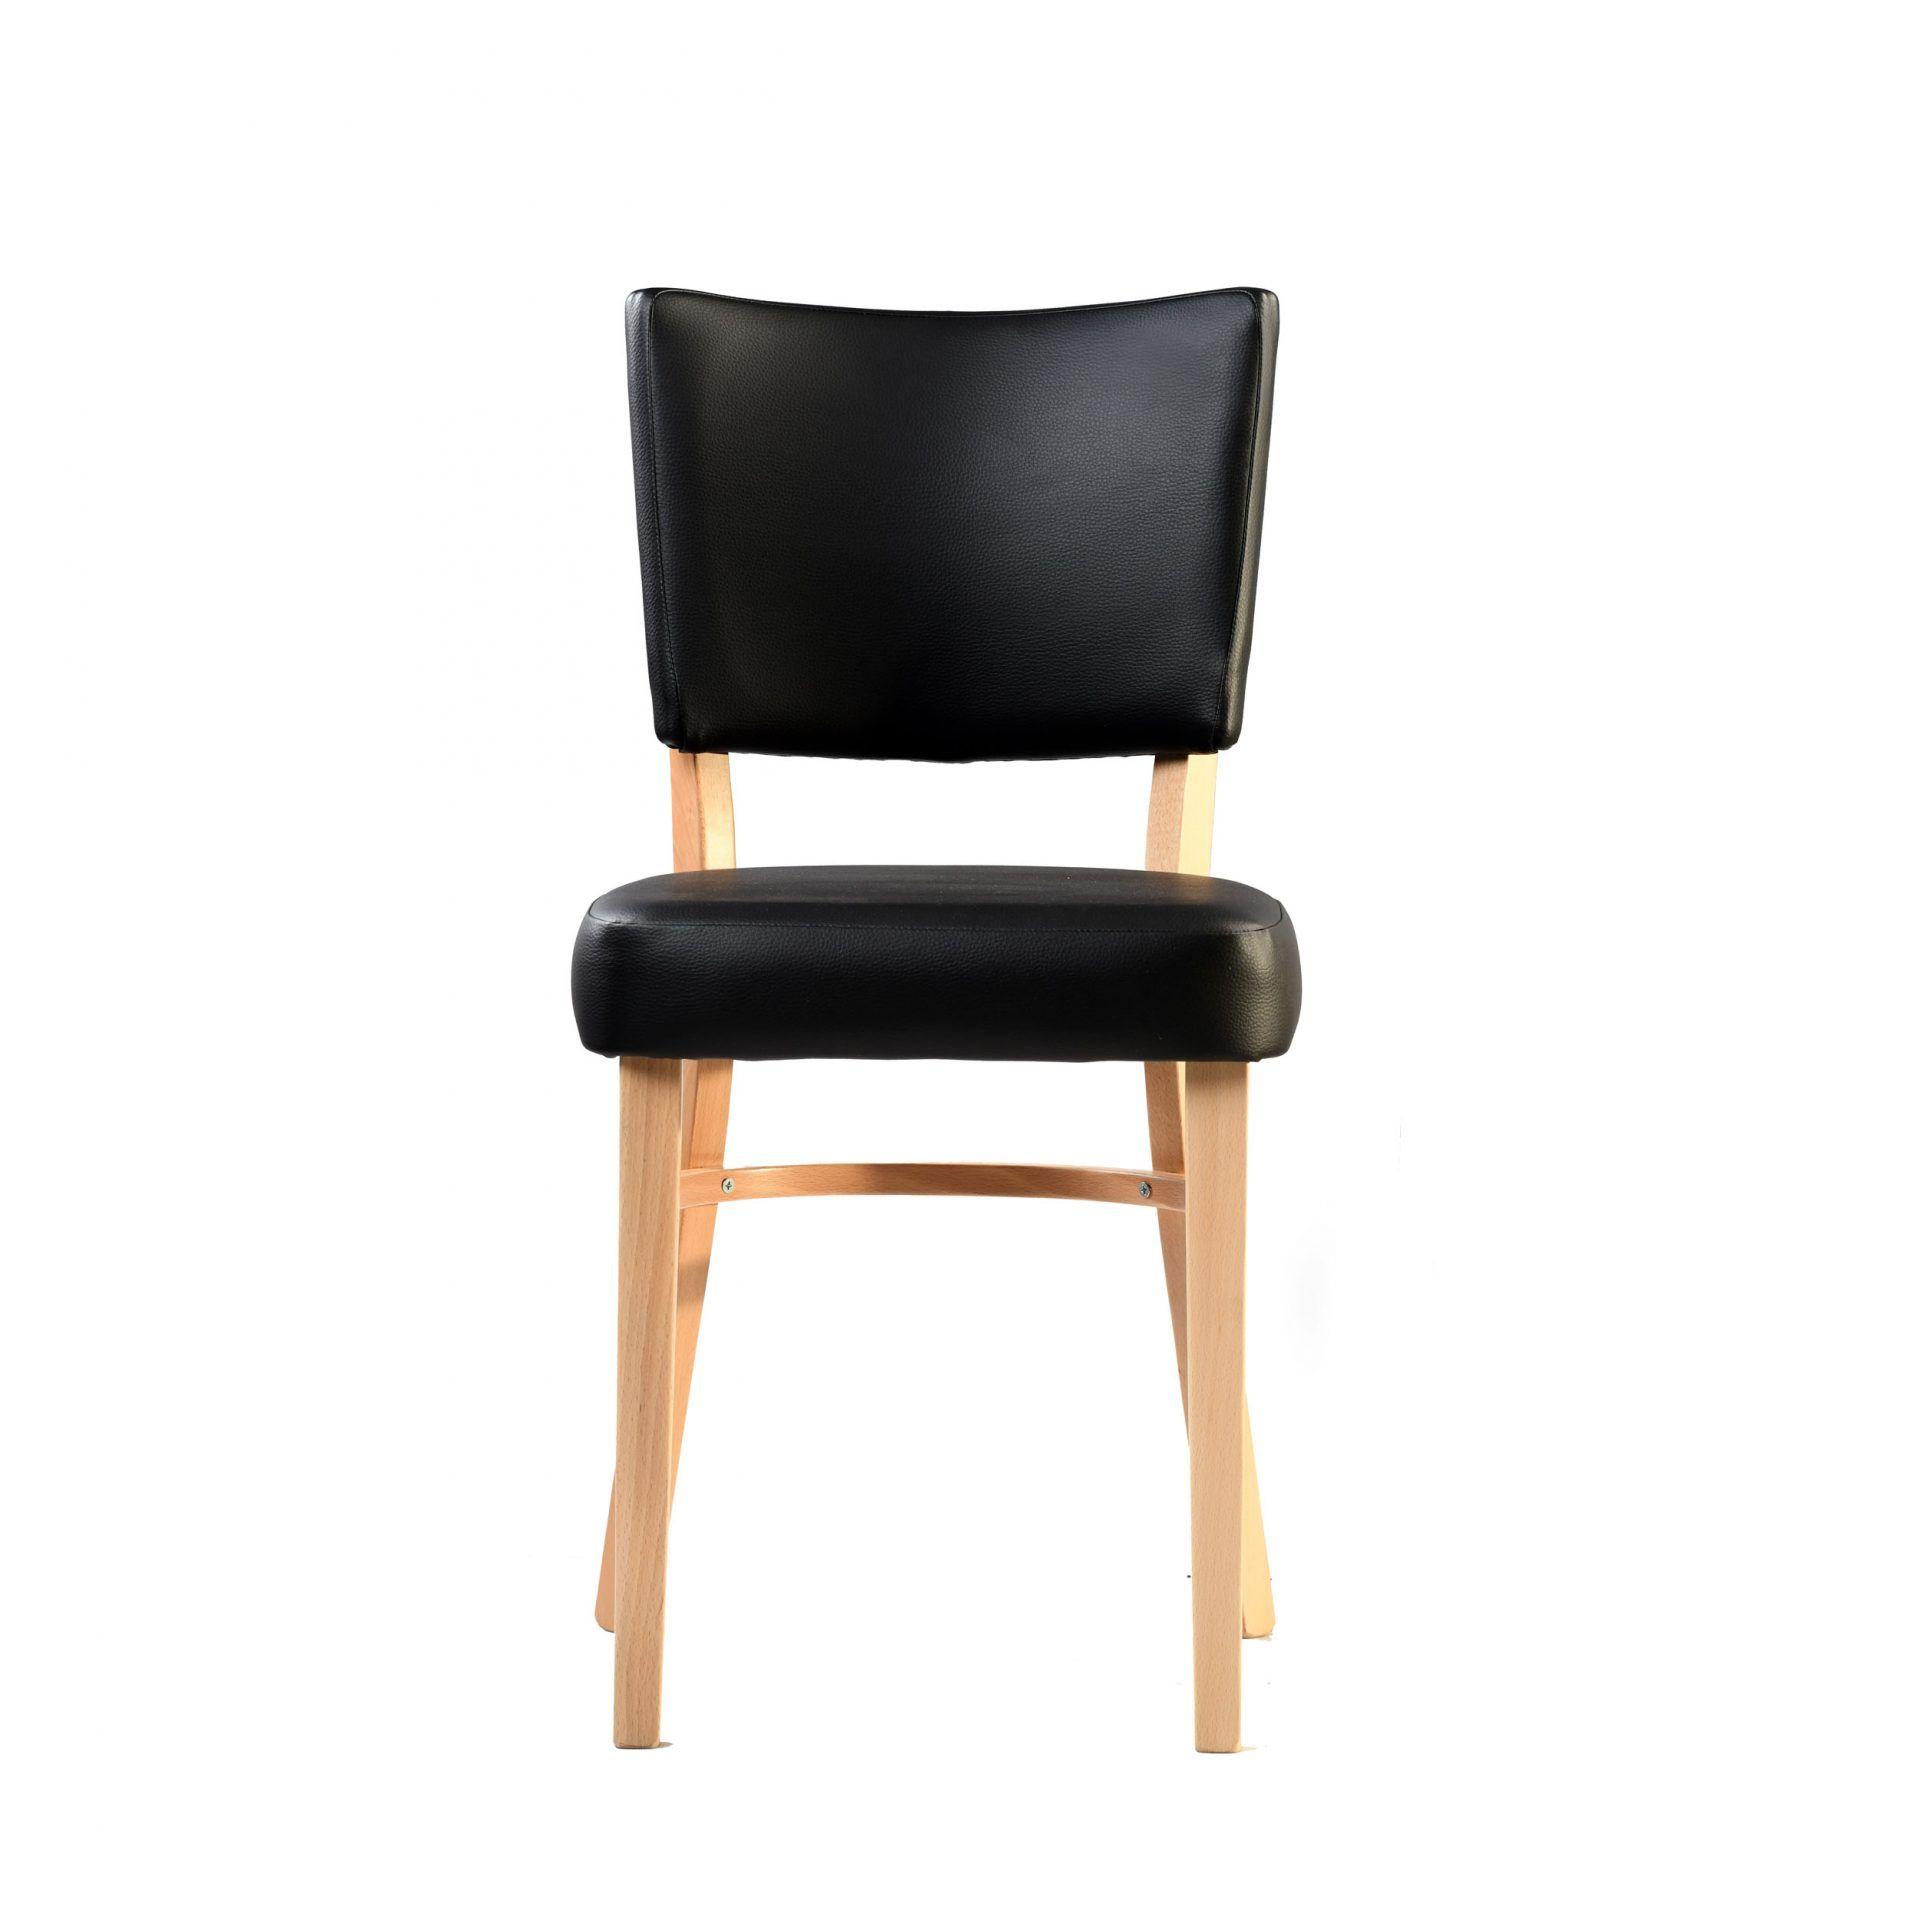 memphis chair black vinyl seat and backrest natural frame front